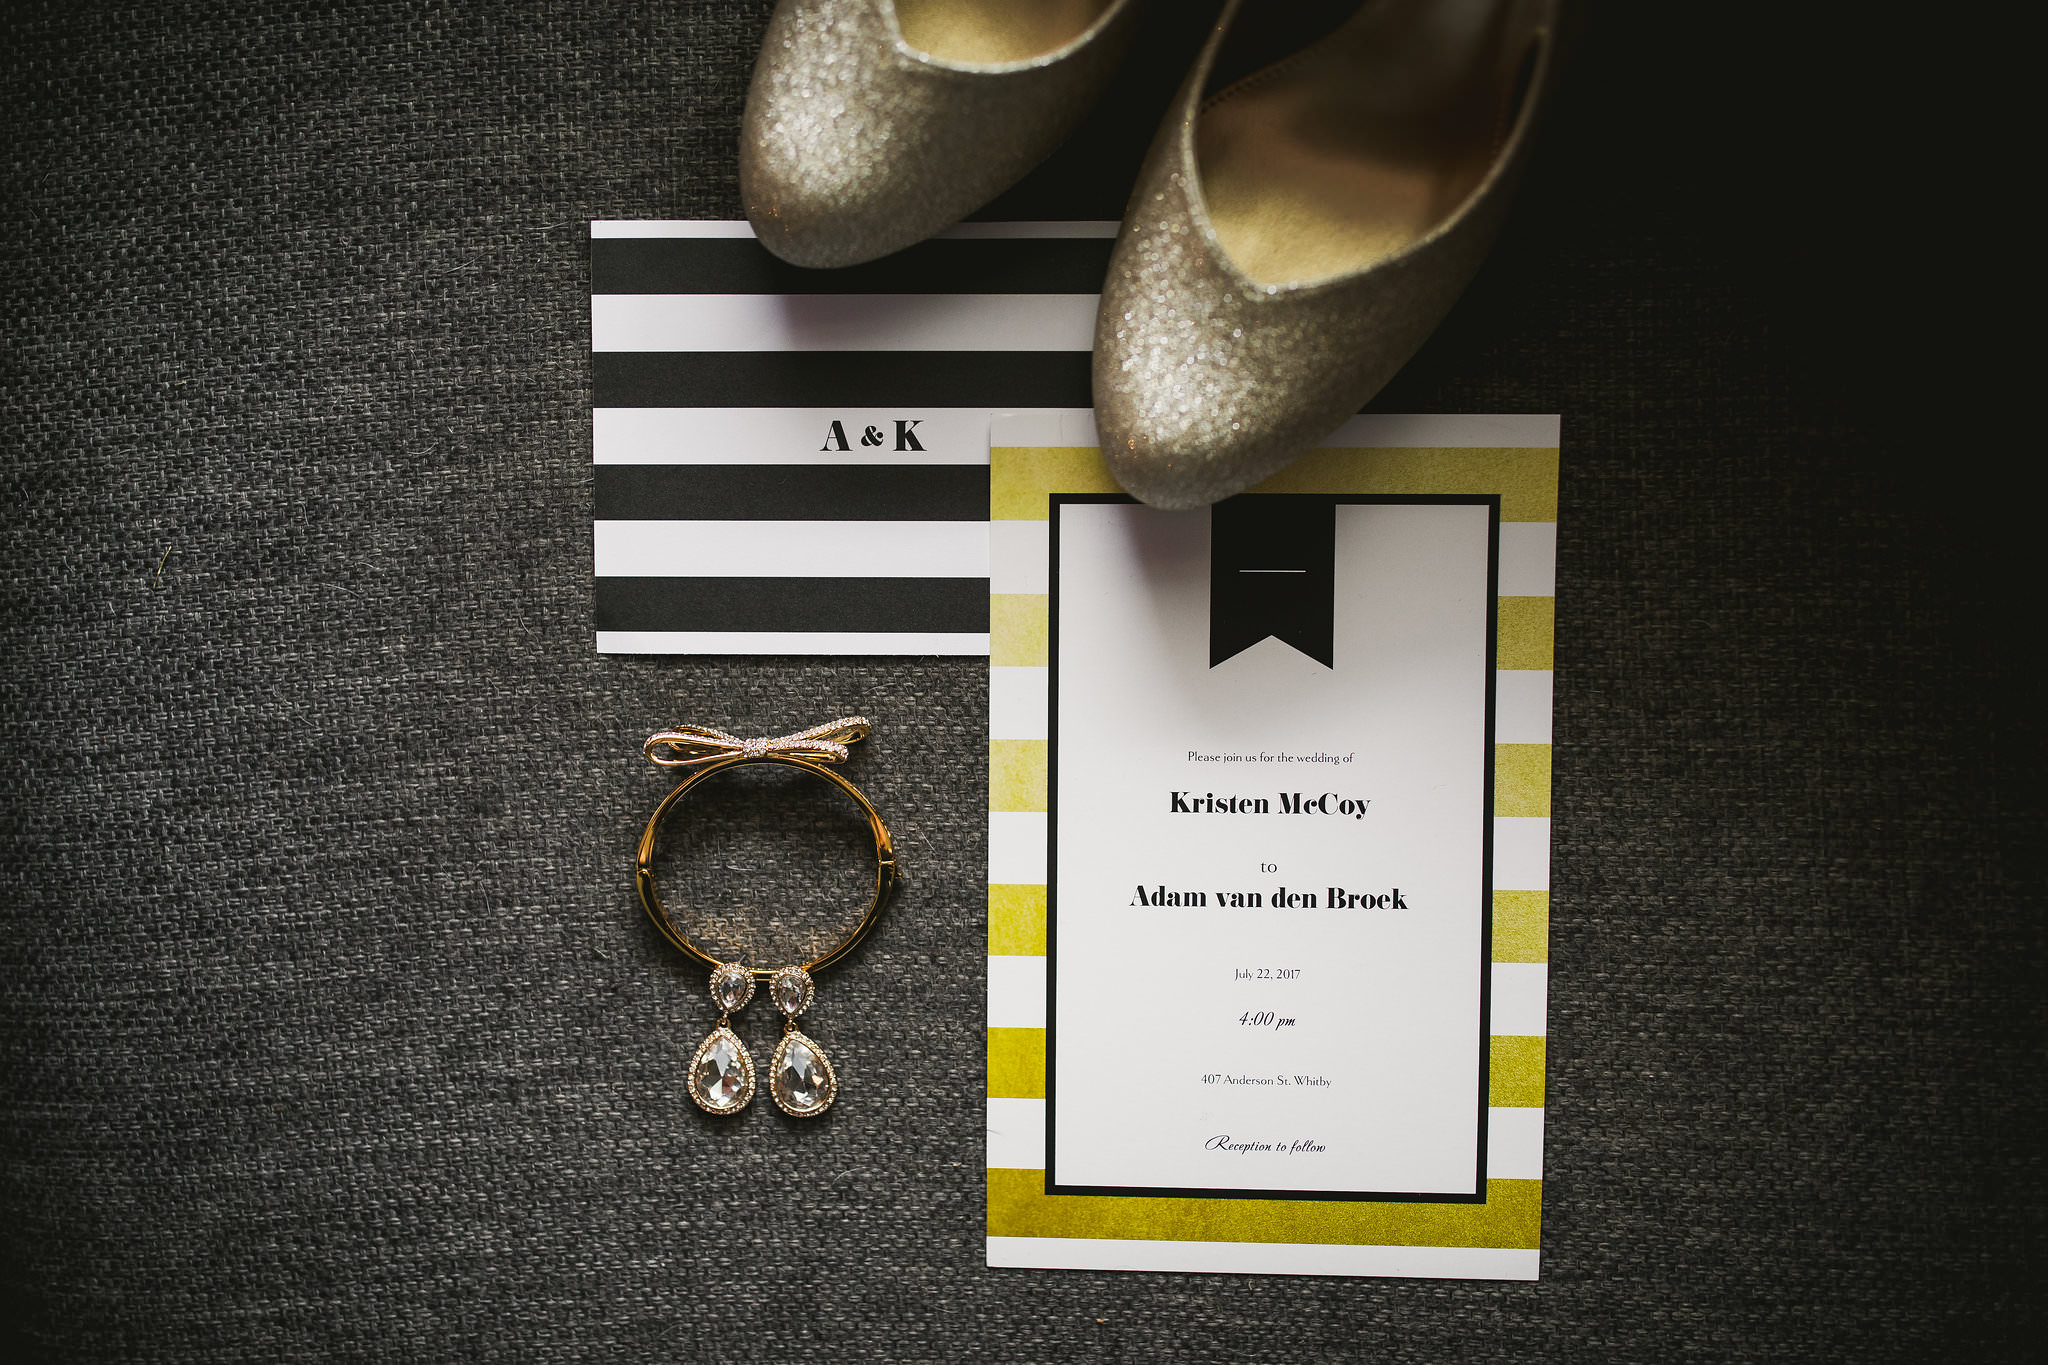 Kristen Adam Kindred Loft Whitby Wedding Photos 43 - Durham Wedding Photographer: Kindred Loft Wedding Photos